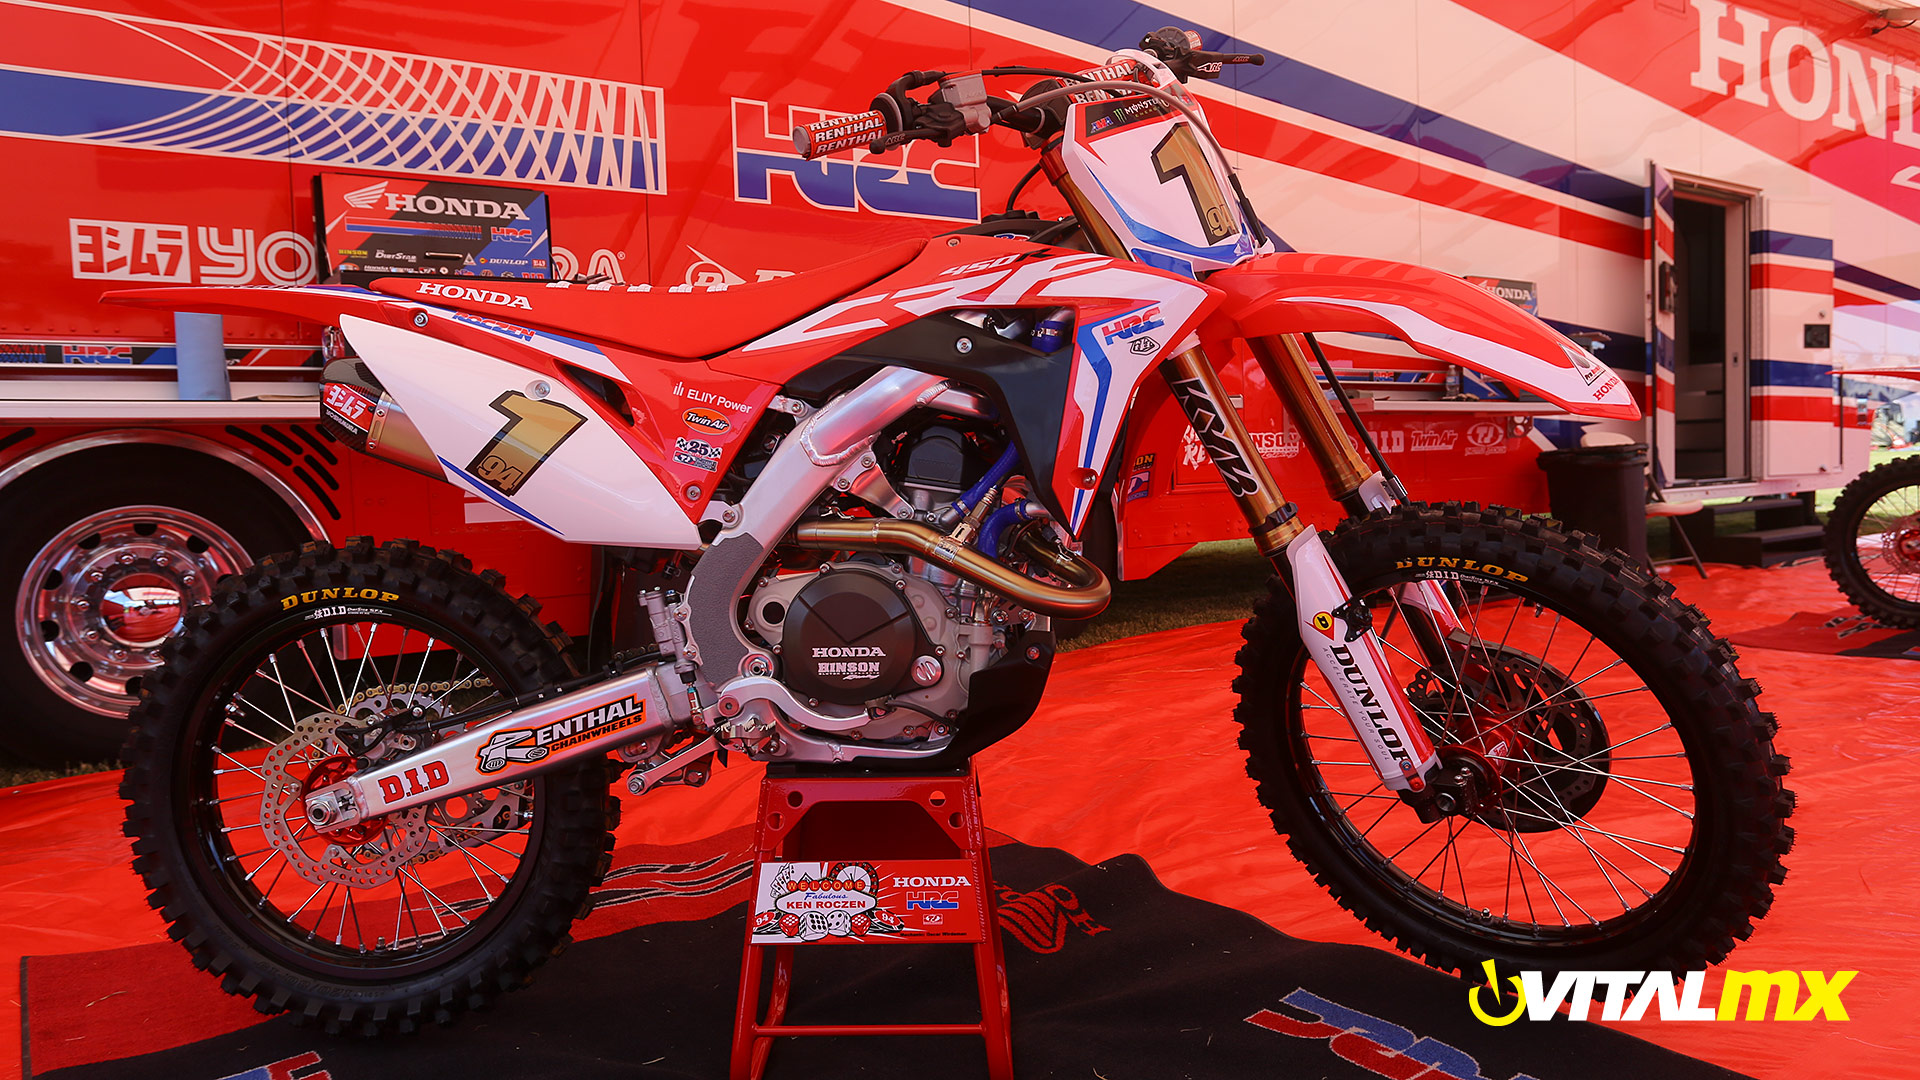 The Big Picture Ken Roczens Team Honda Hrc Bike Motocross